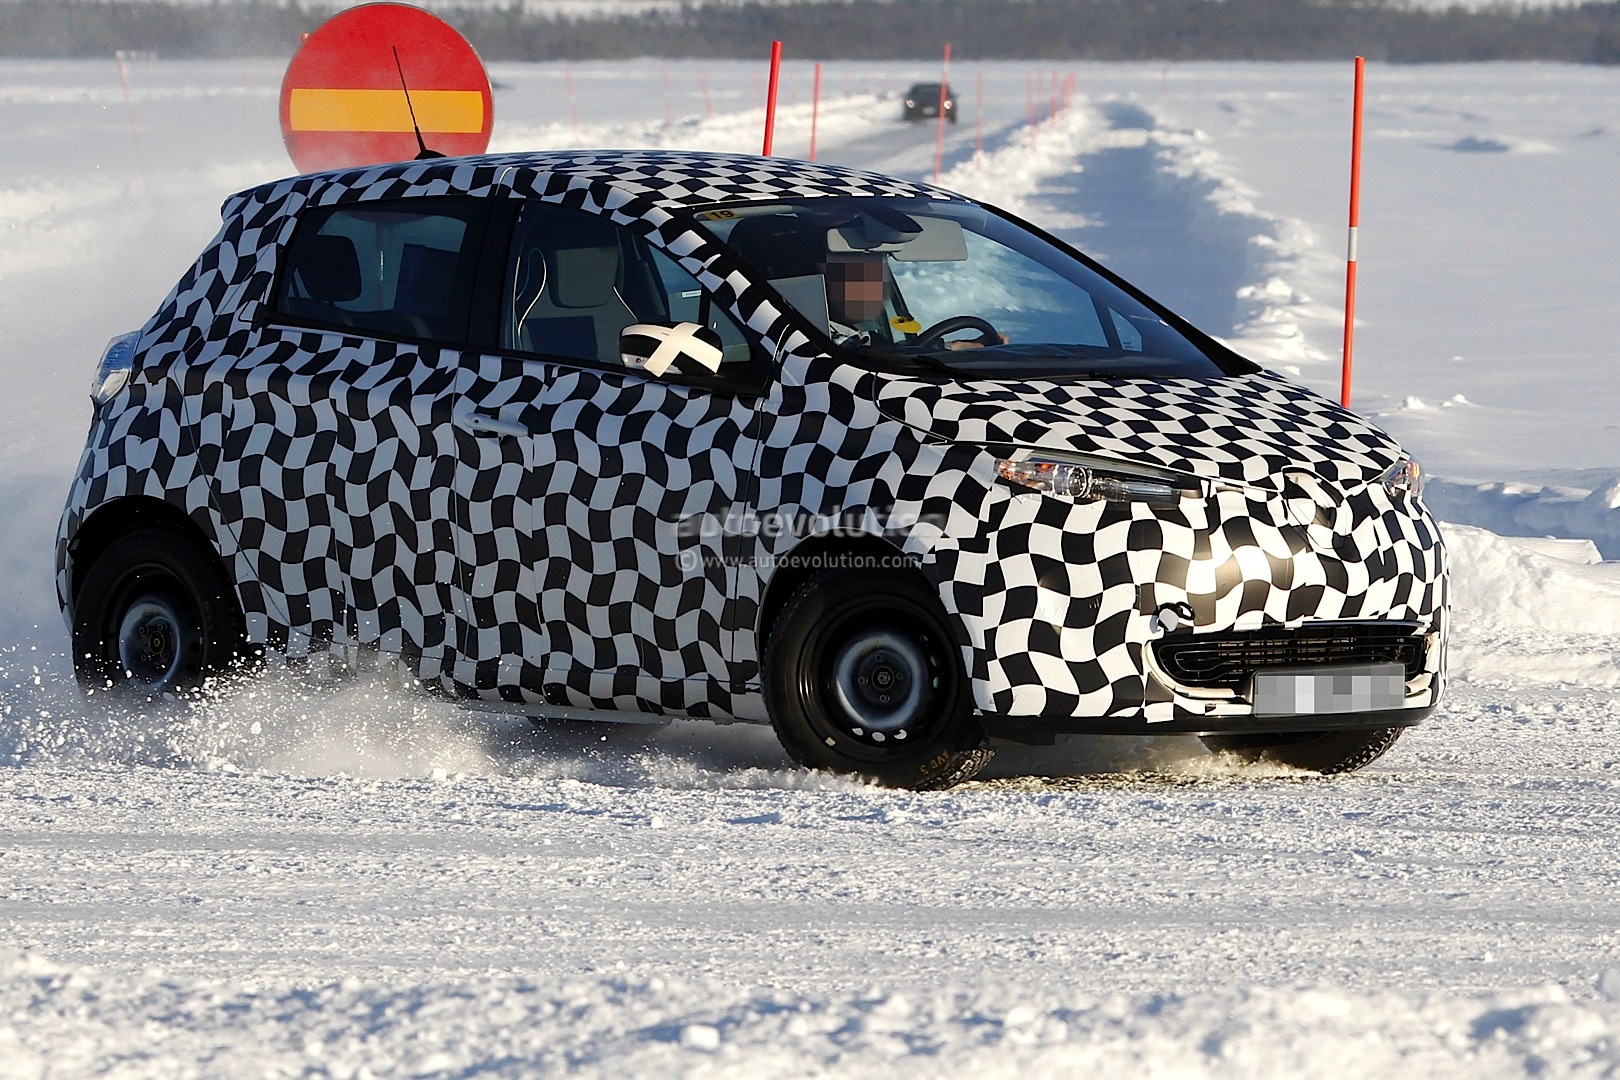 Best Auto Recovery >> Spyshots: Renault Zoe Electric Supermini - autoevolution